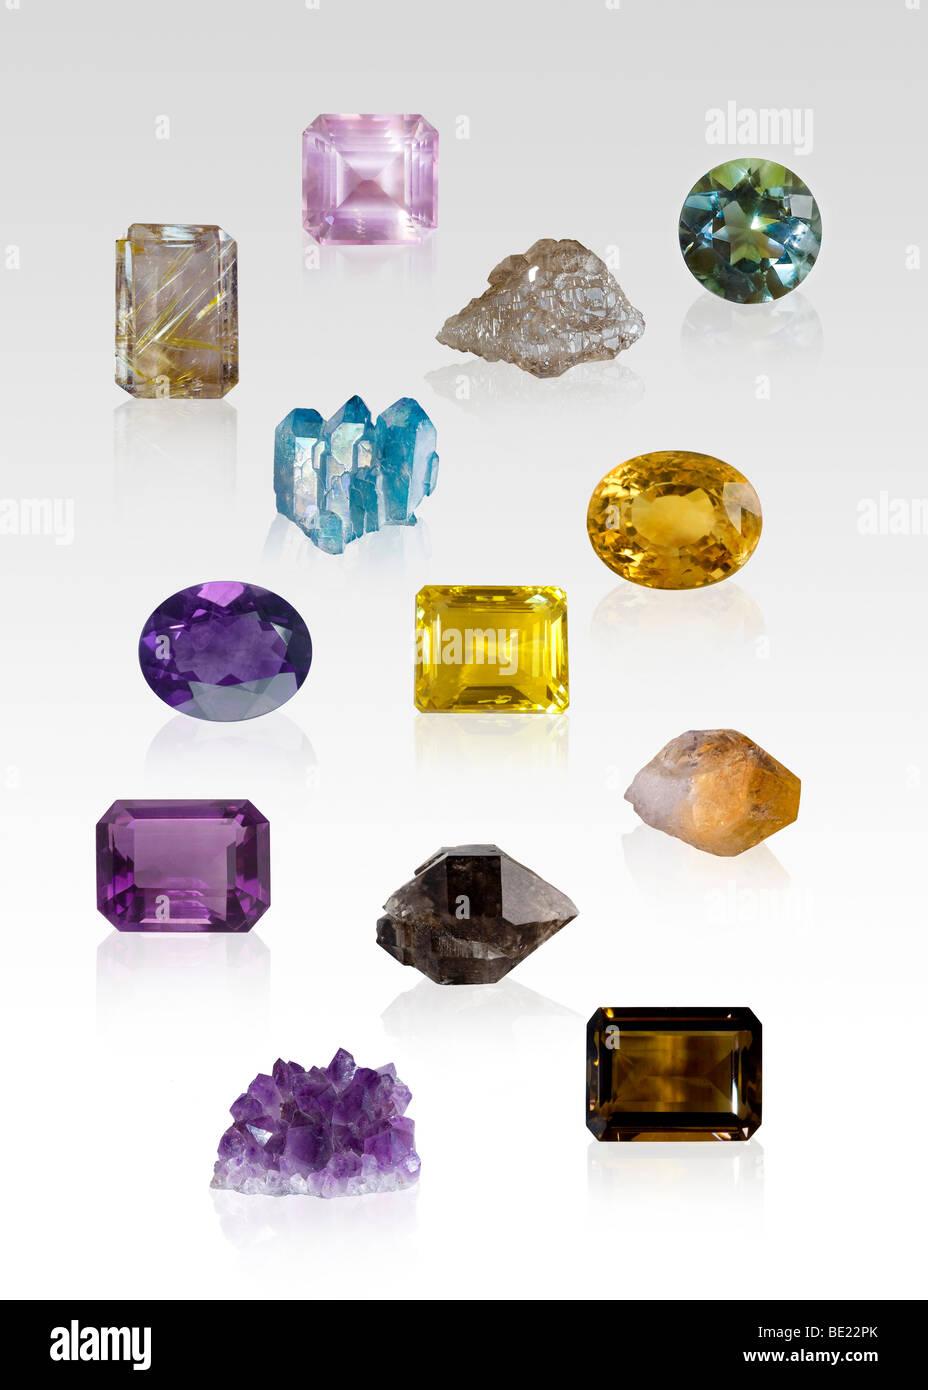 Quartz gem and crystal specimens on white background - Stock Image